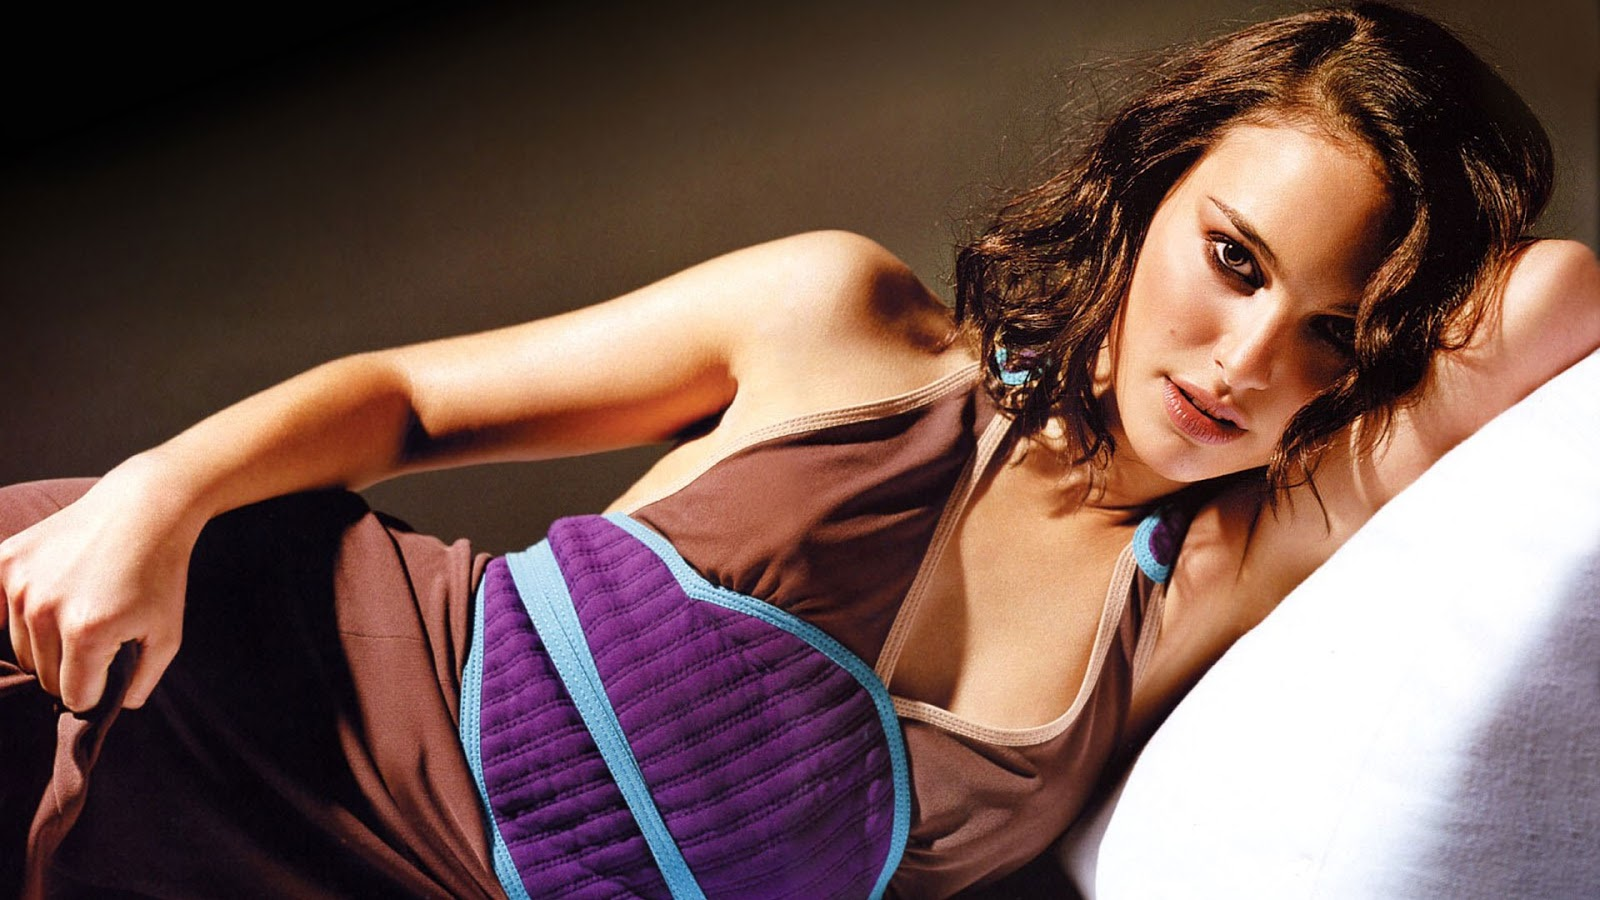 Natalie Portman Hot Photoshoot HD